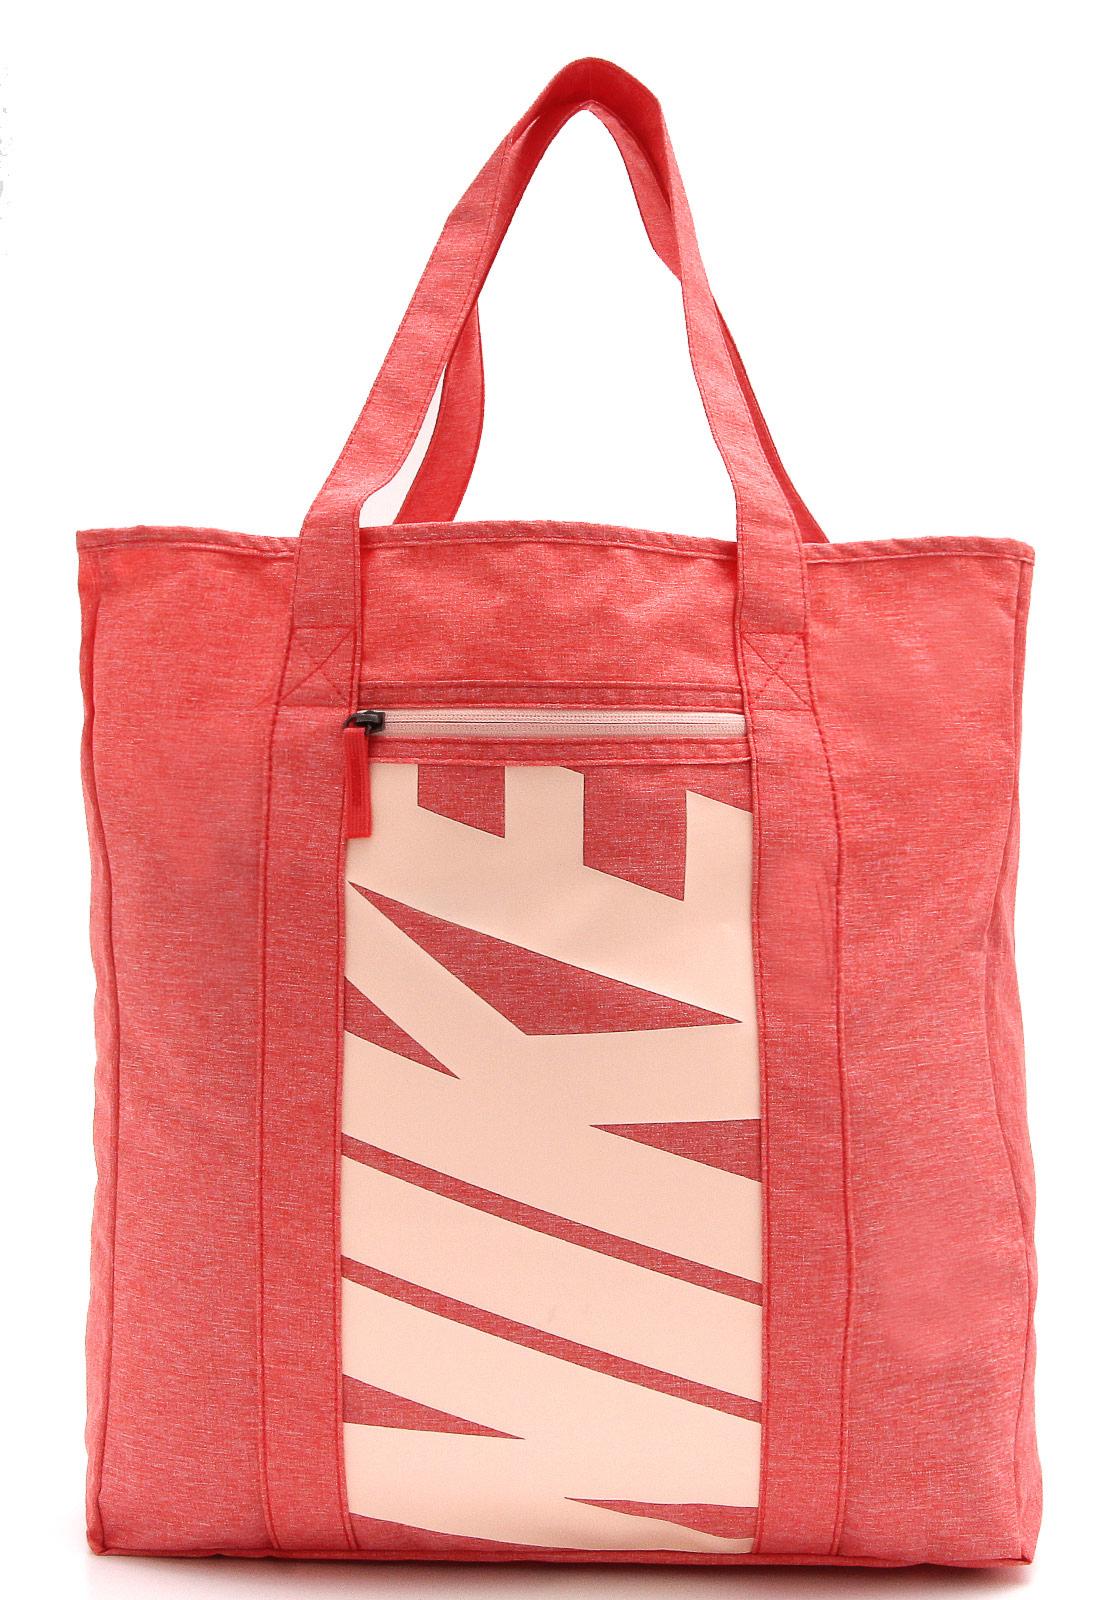 fe0efa601d4c1 Centauro - Bolsa Nike C72 Legend 2.0 Feminina | Bolsas | Bolsas nike, Bolsas  esportivas femininas und Bolsas